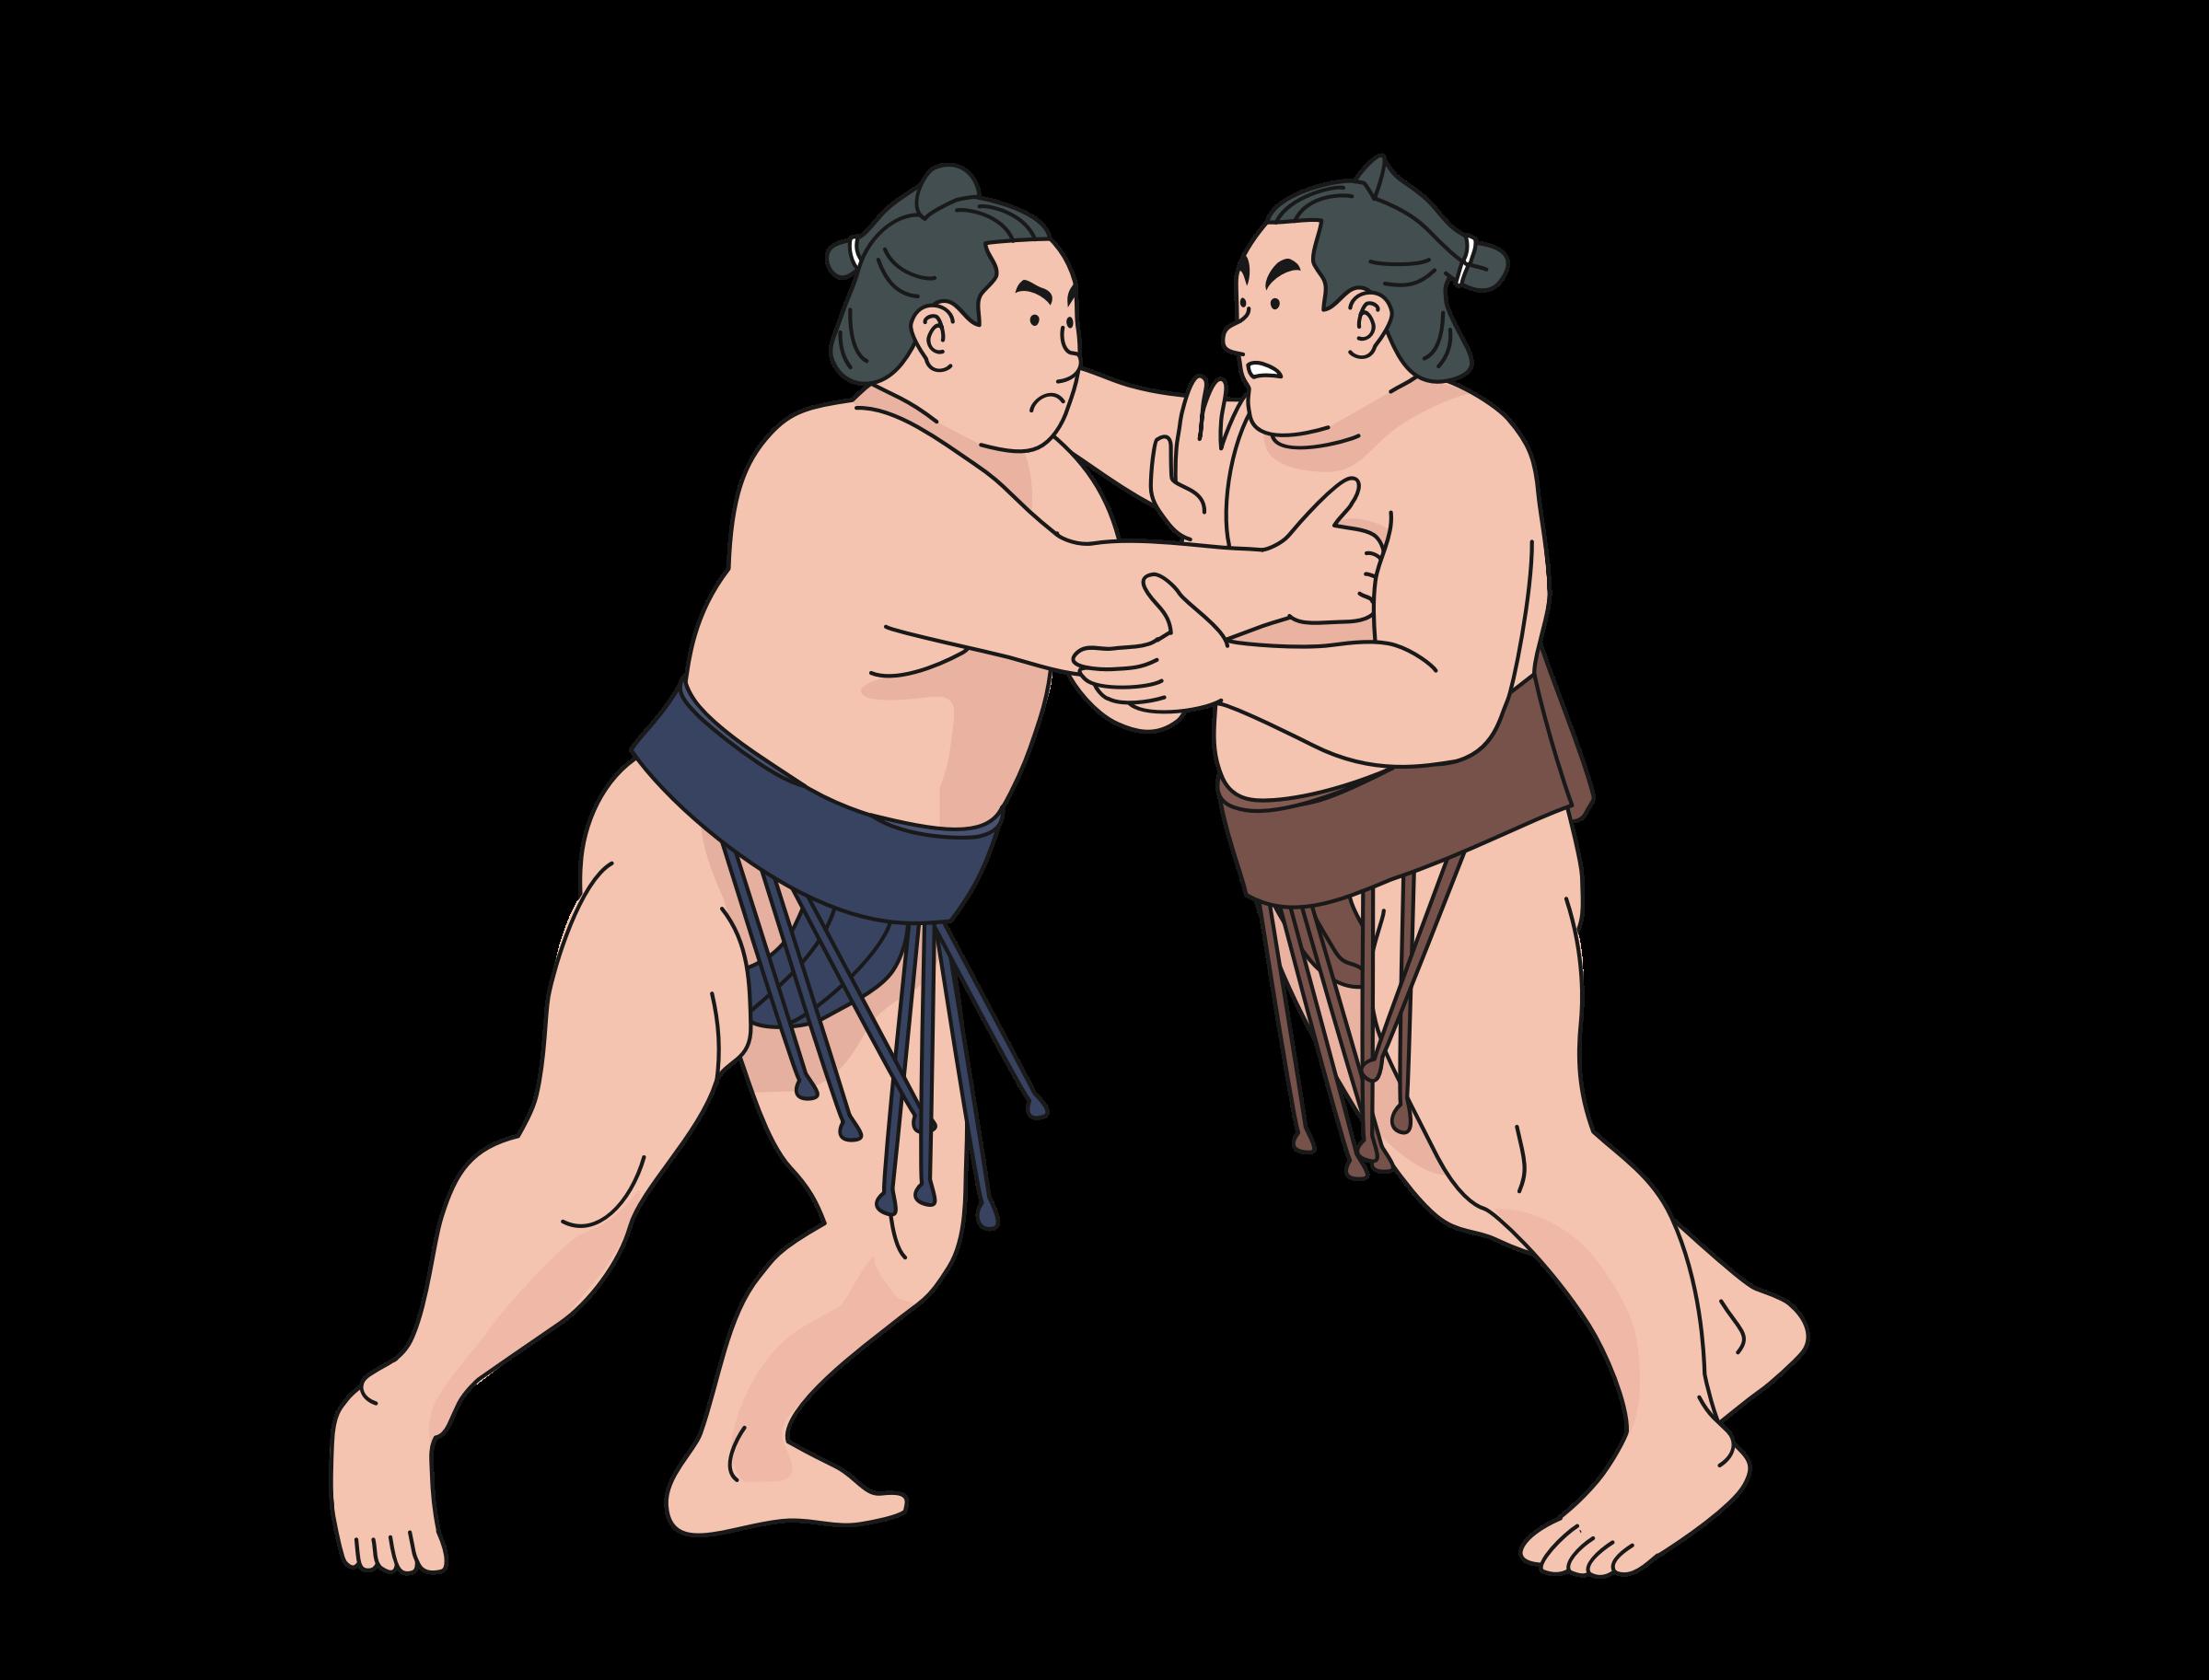 picture library Wrestler clipart sumo wrestler. Wrestlers big image png